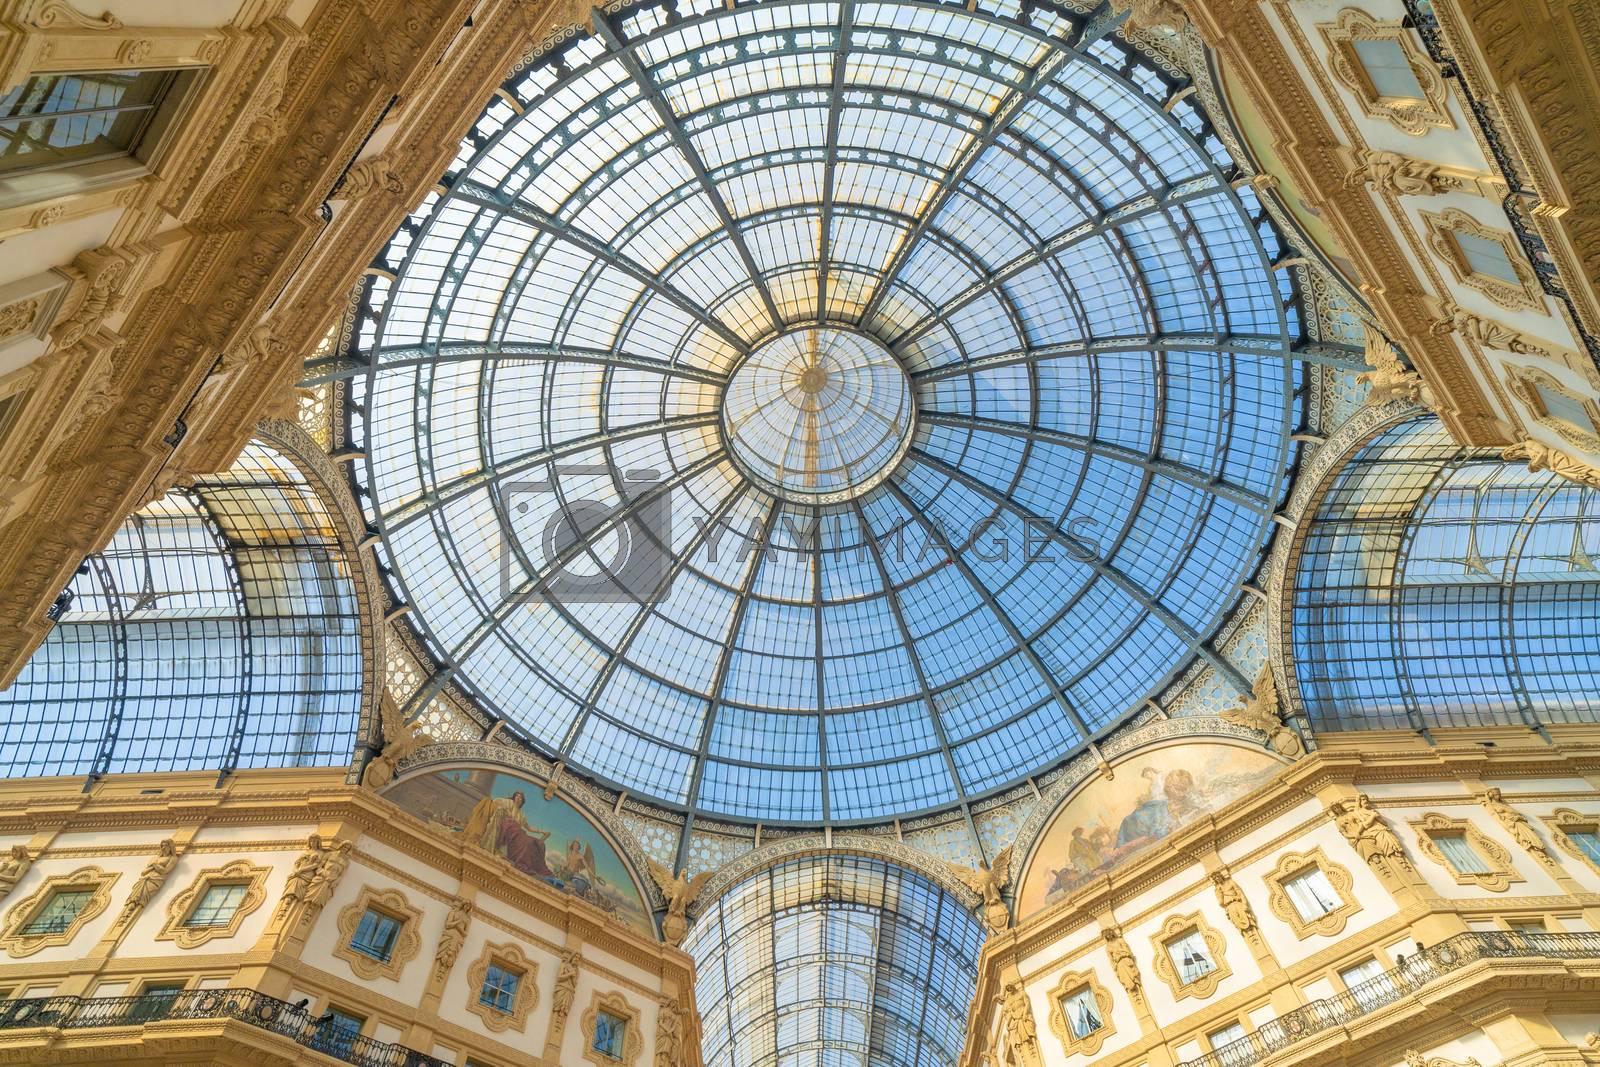 Royalty free image of Galleria Vittorio Emanuele II in Milan, Italy. by maramade